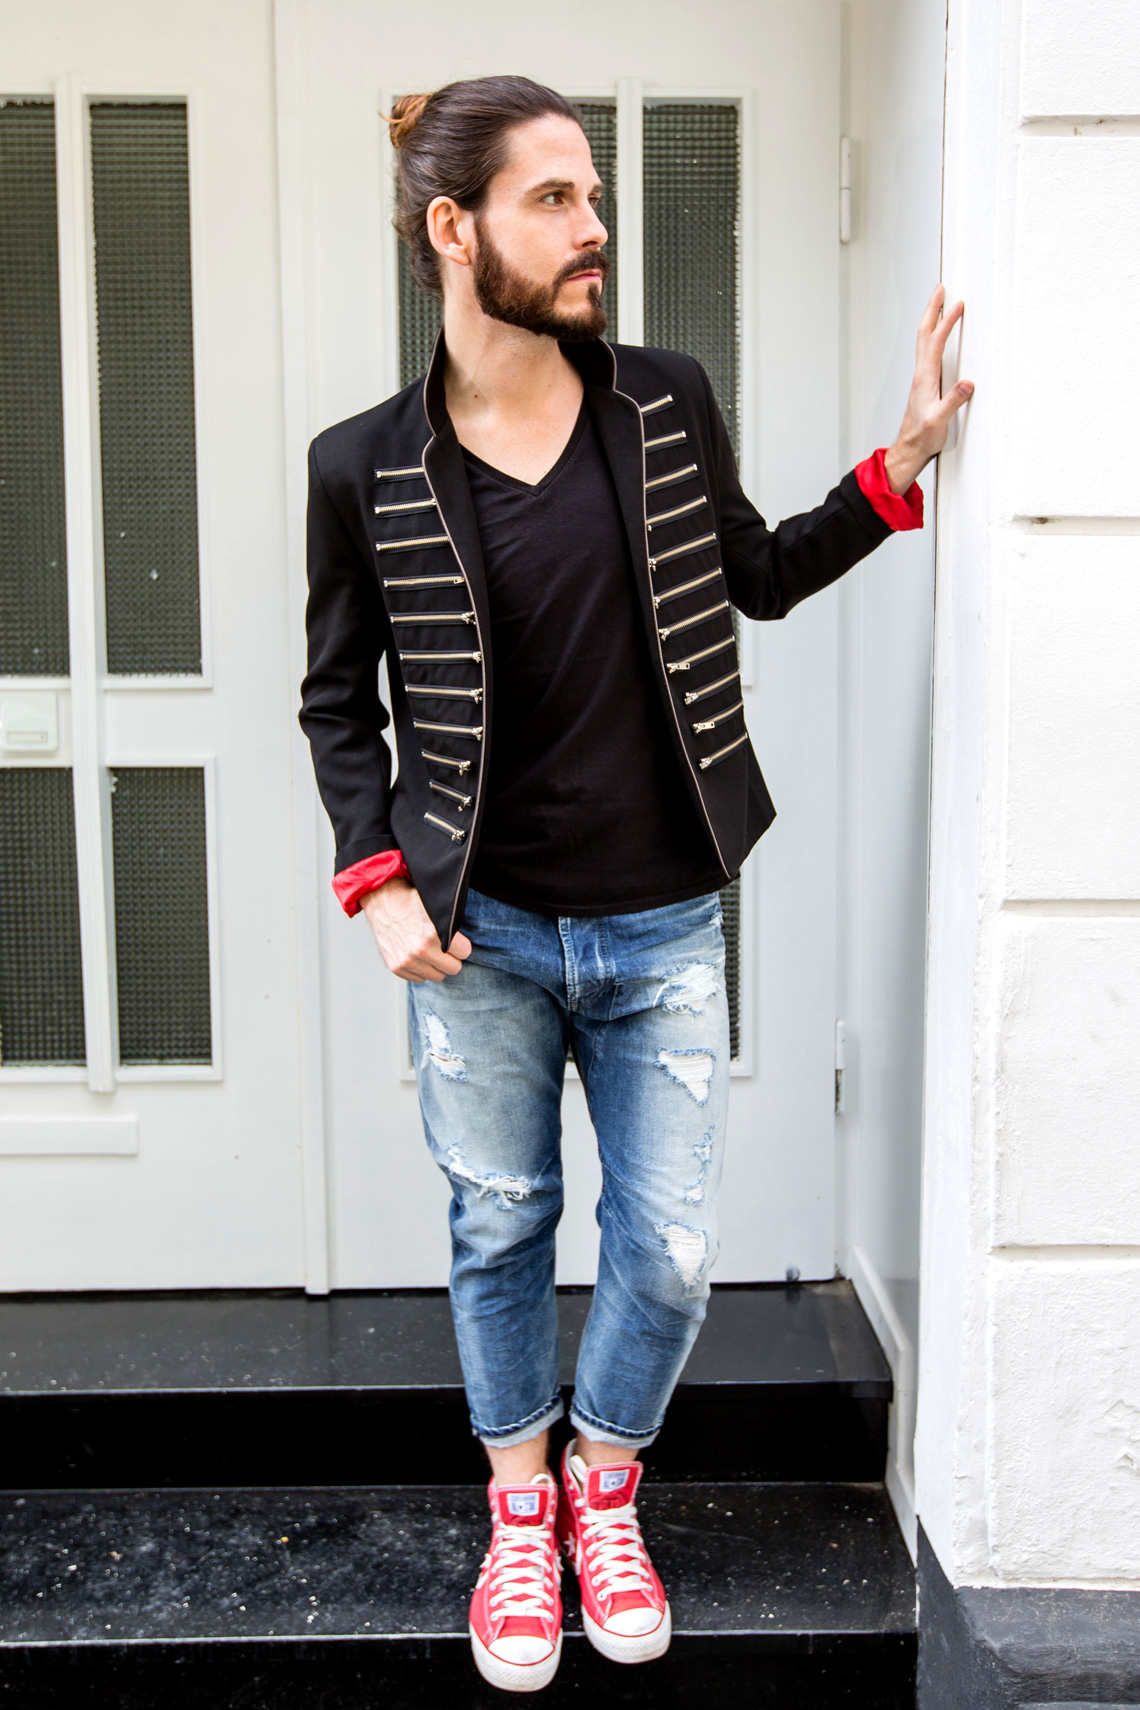 Malefashion-Blog-Kaisers-neue-Kleider-Sakko-Jeans-Chucks-Streetstyle-Manbun-Malemodel-Männermode